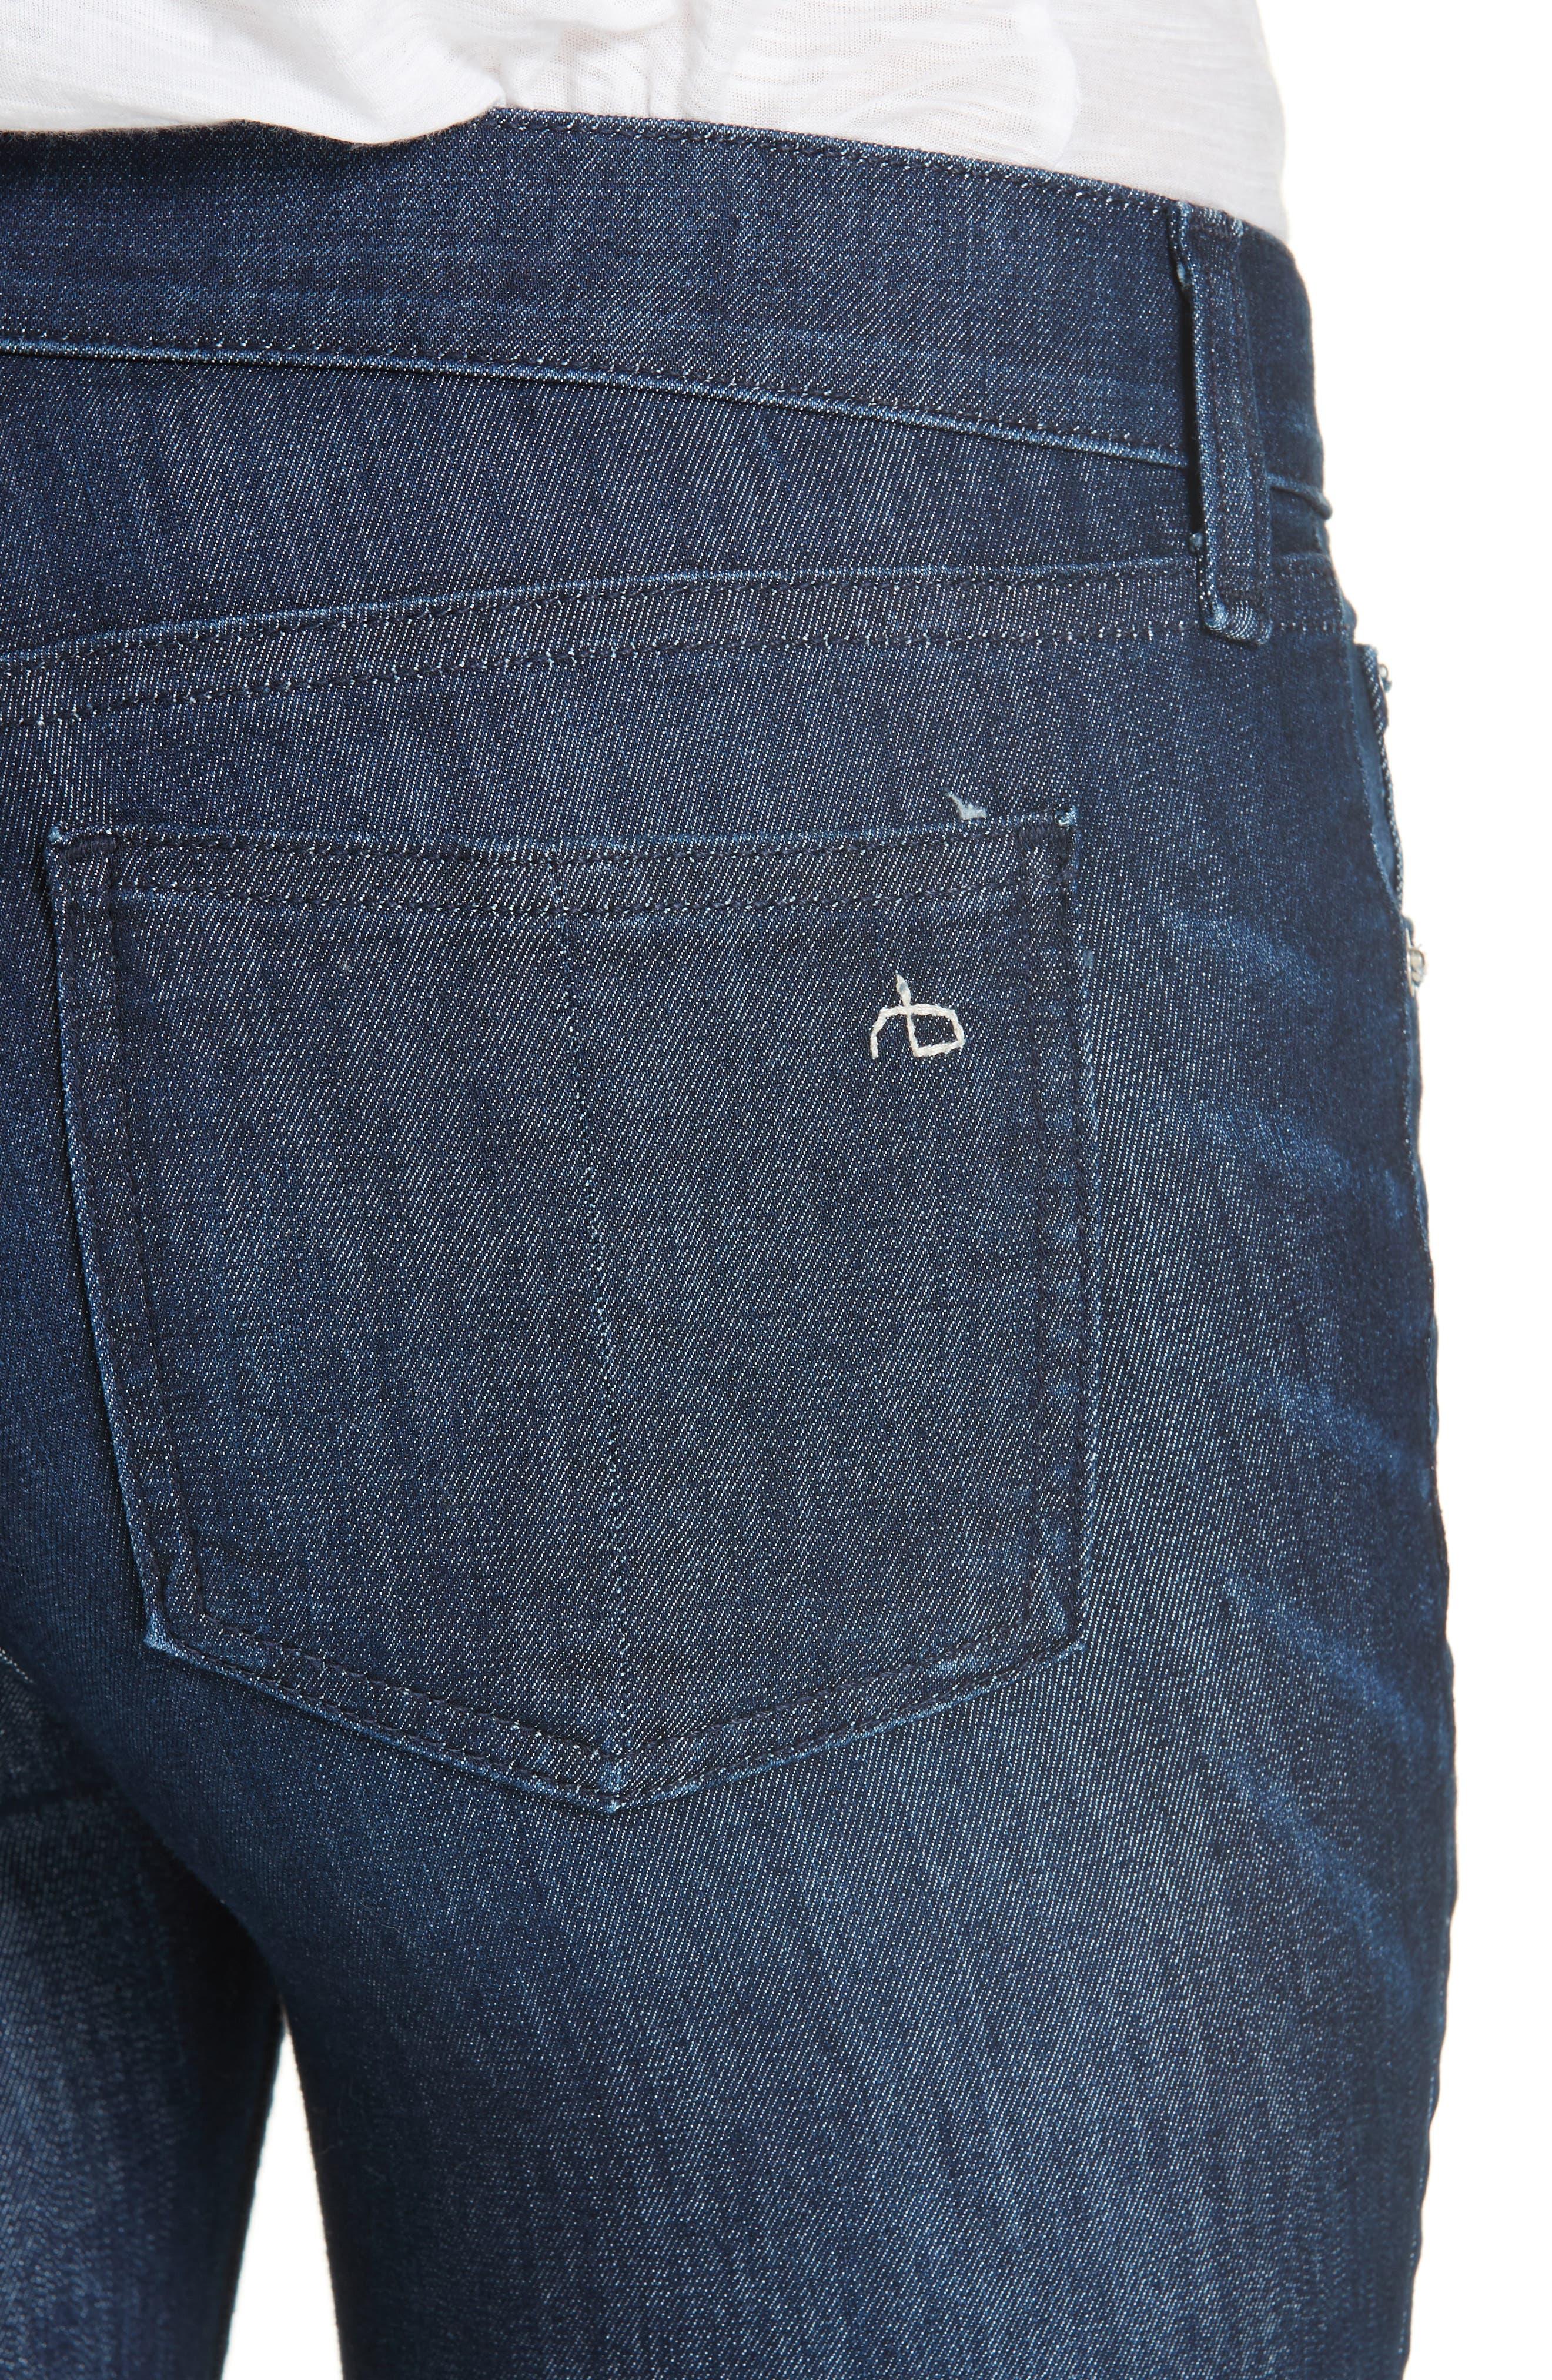 RAG & BONE, Raw Hem Ankle Skinny Jeans, Alternate thumbnail 5, color, TONAL RIVER